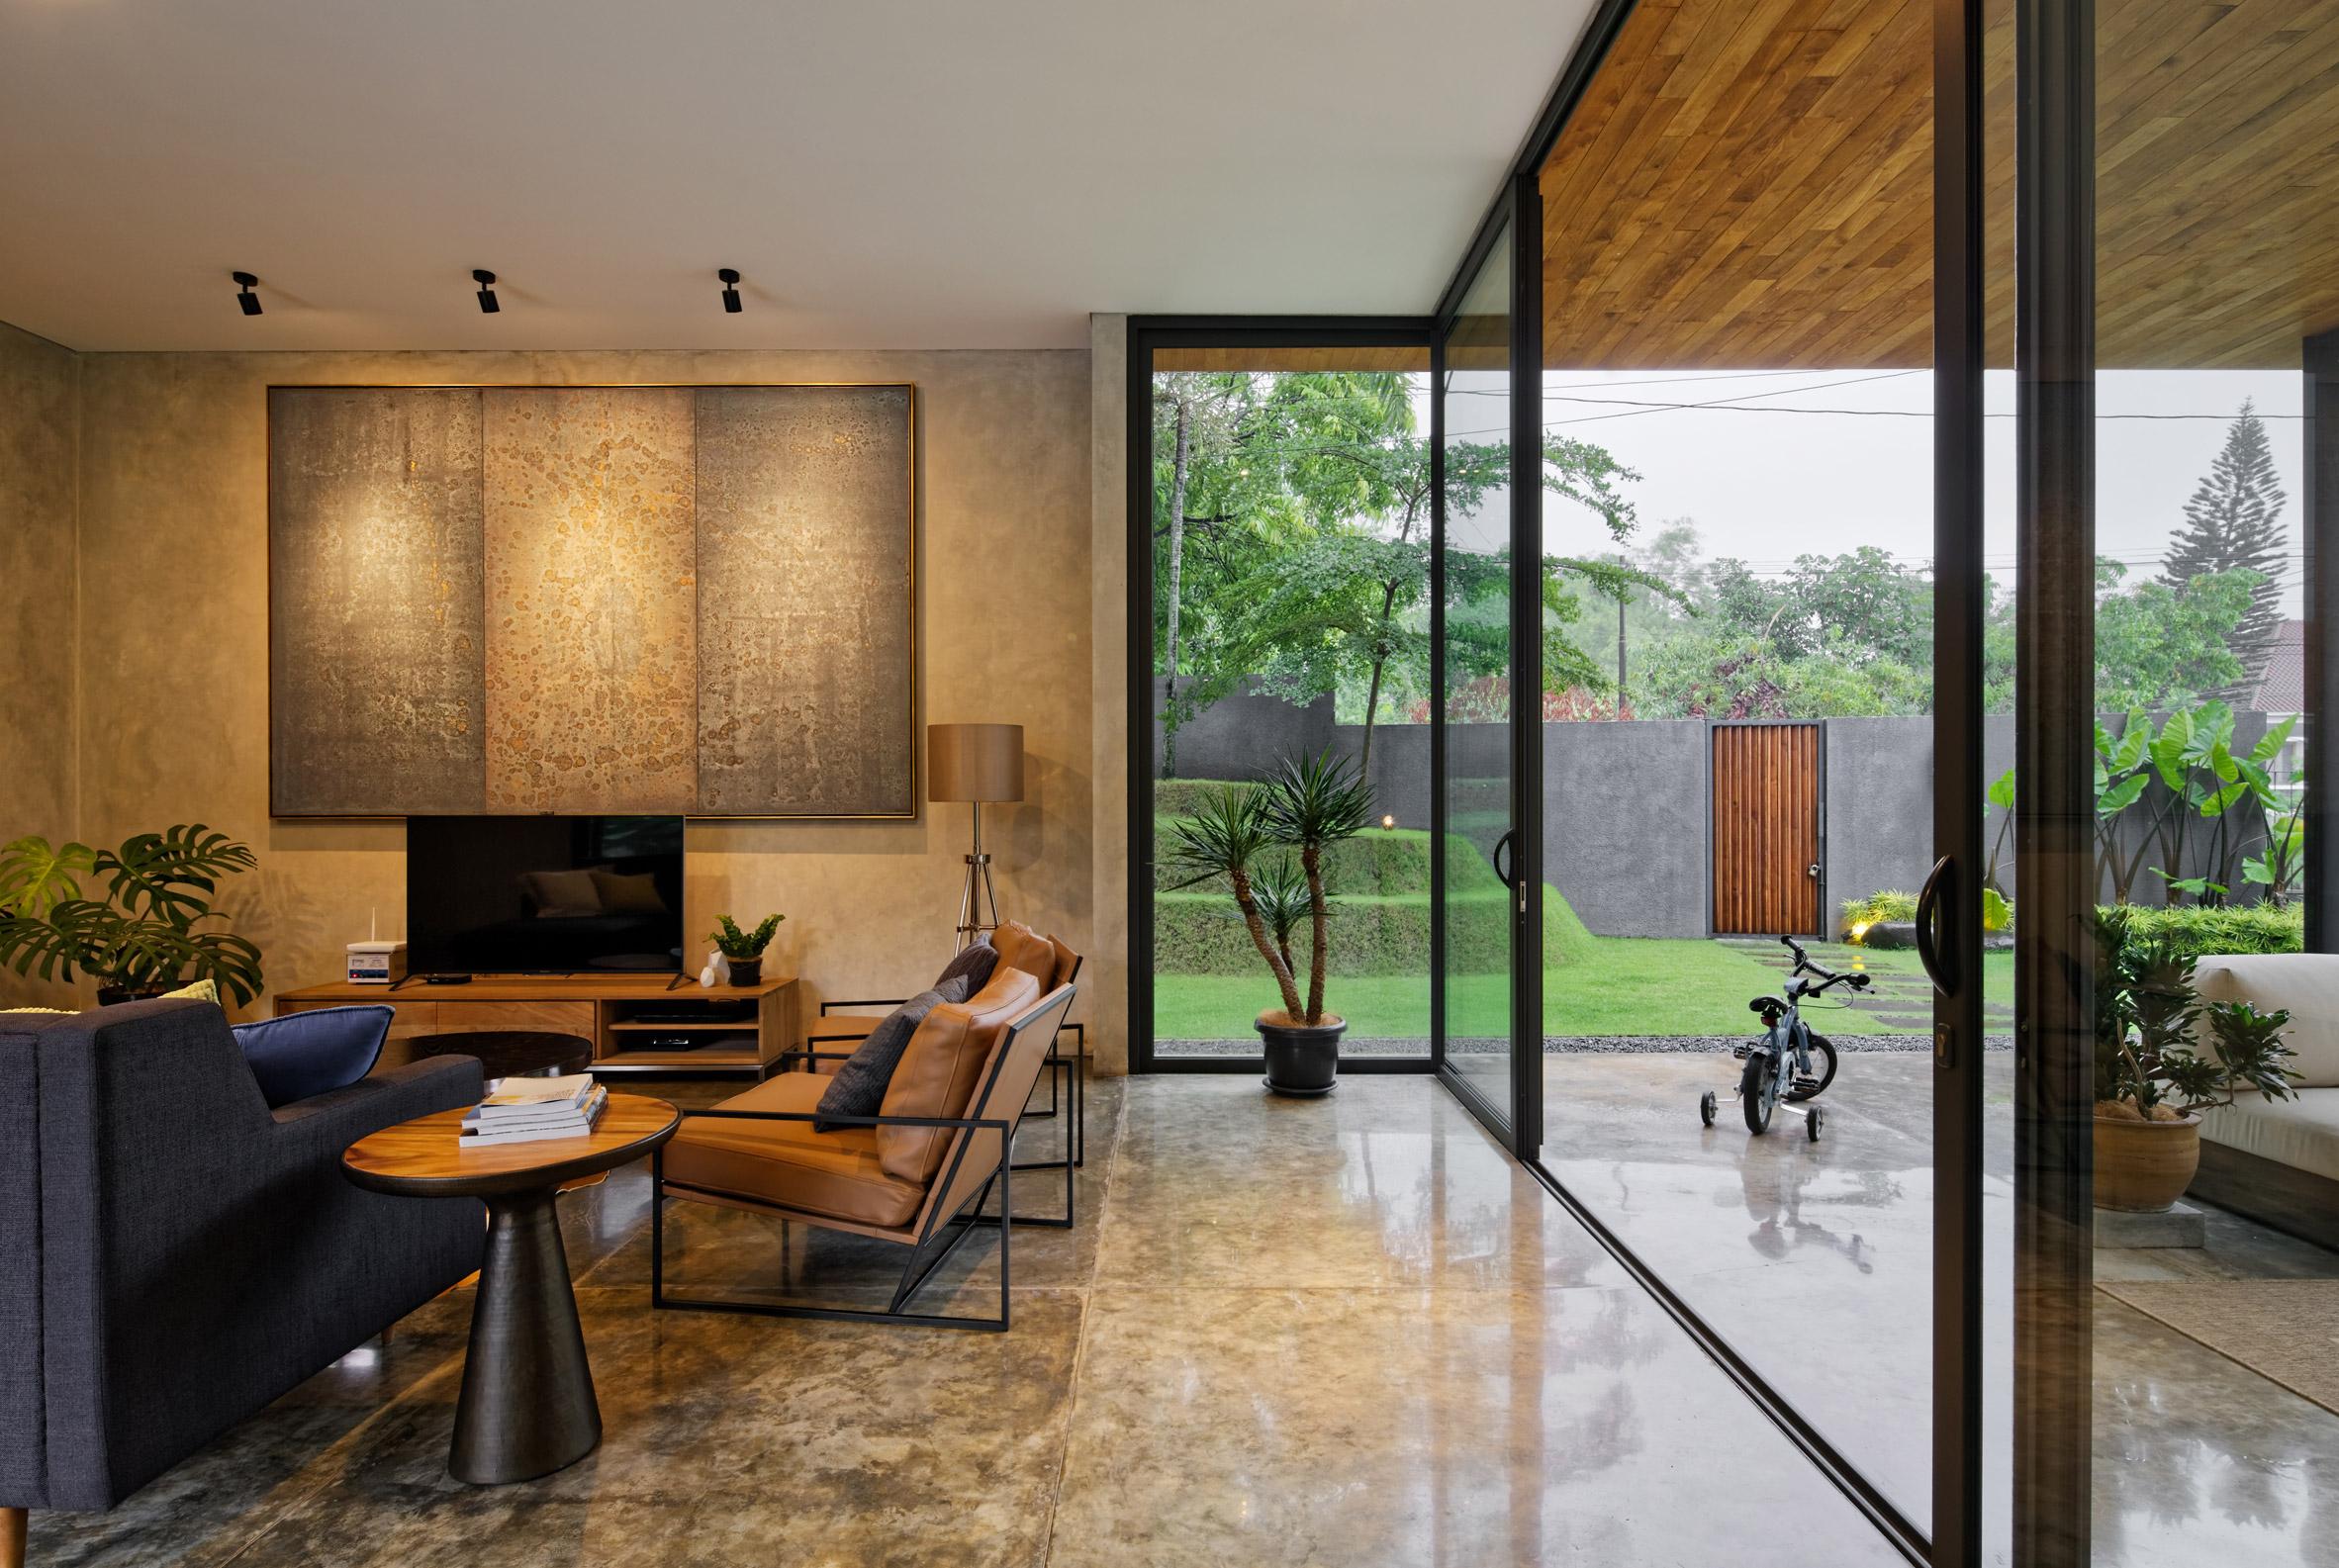 house-inside-outside-tamara-wibowo-architecture-residential-indonesia_dezeen_2364_col_1.jpg